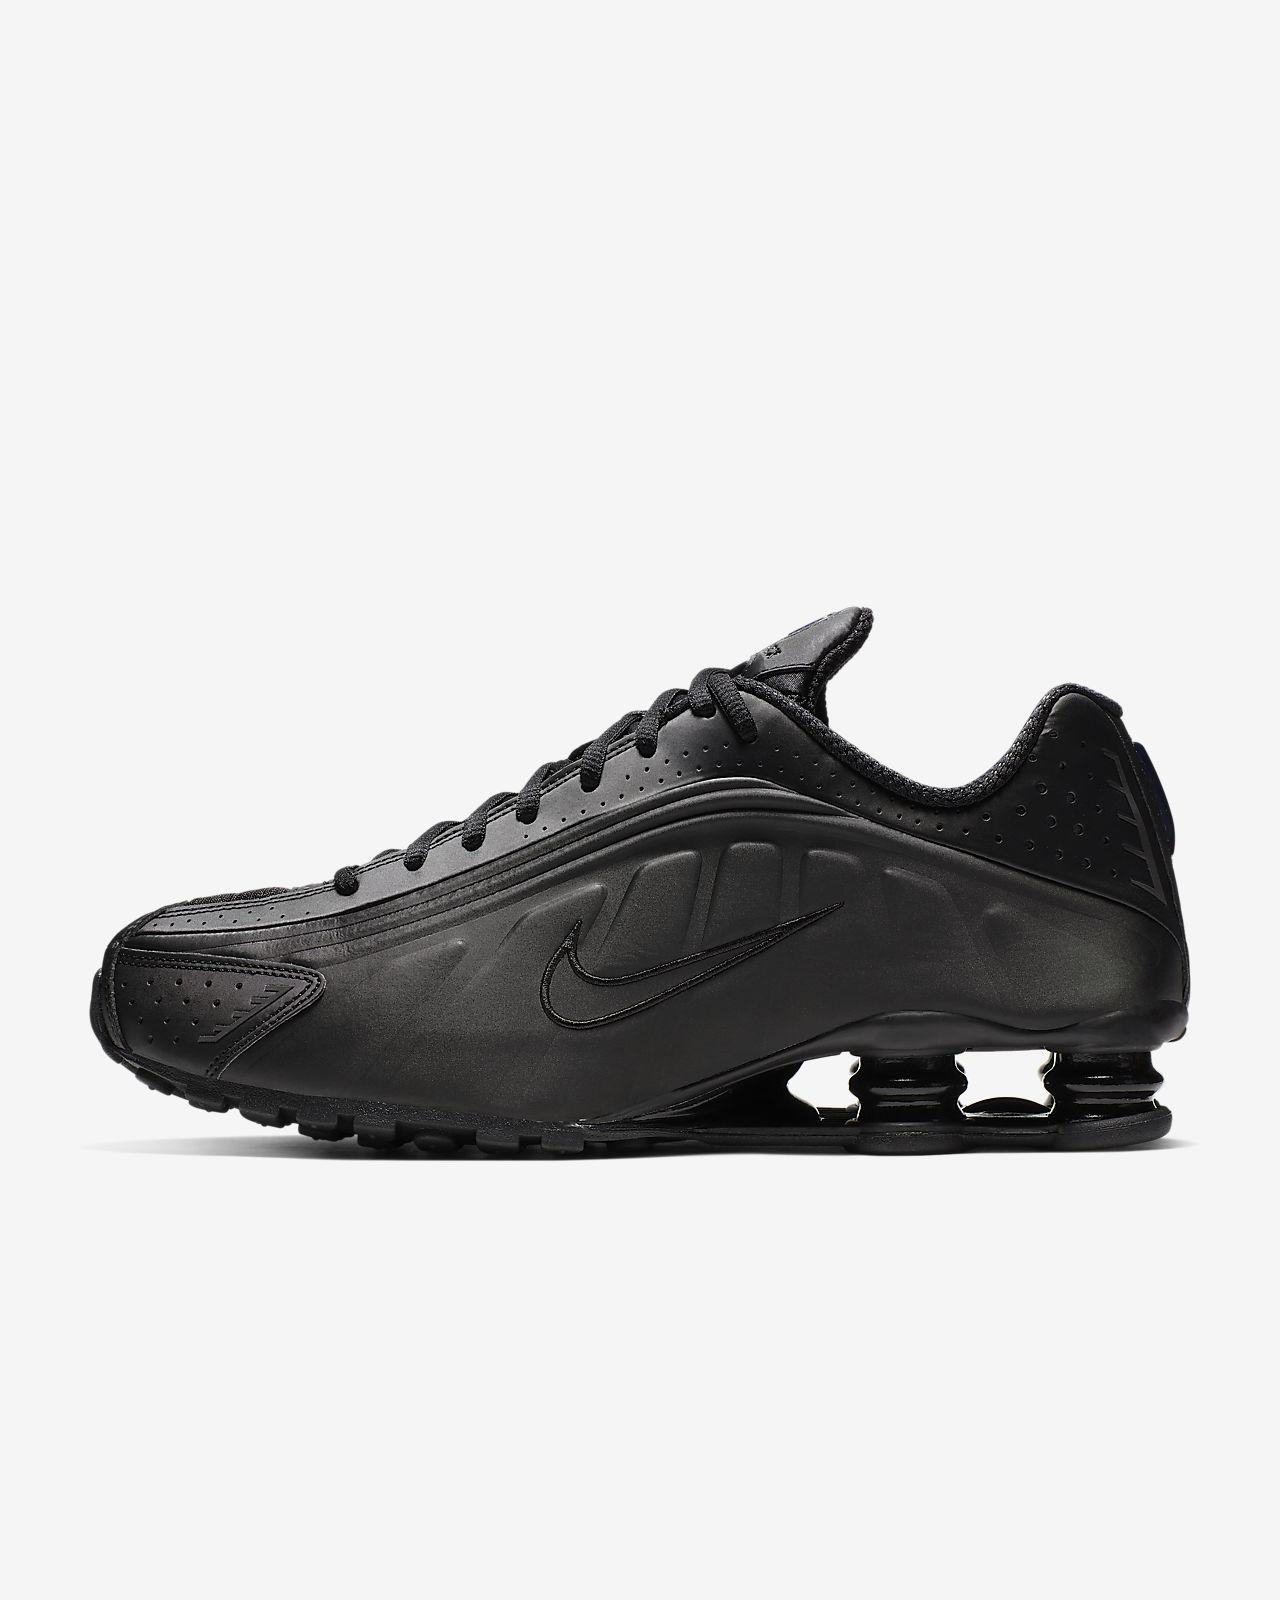 Chaussure Nike Shox R4